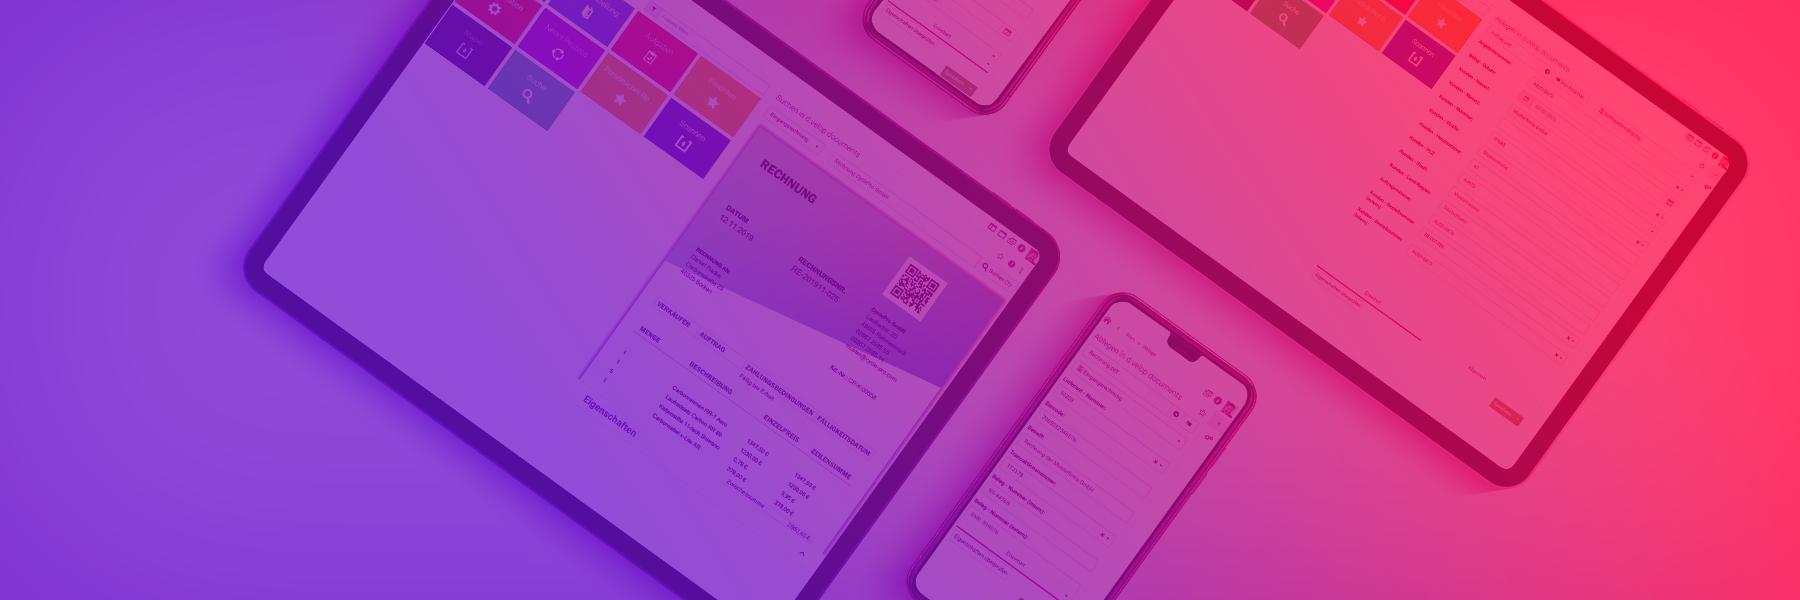 dvelop-documents-webinar-header